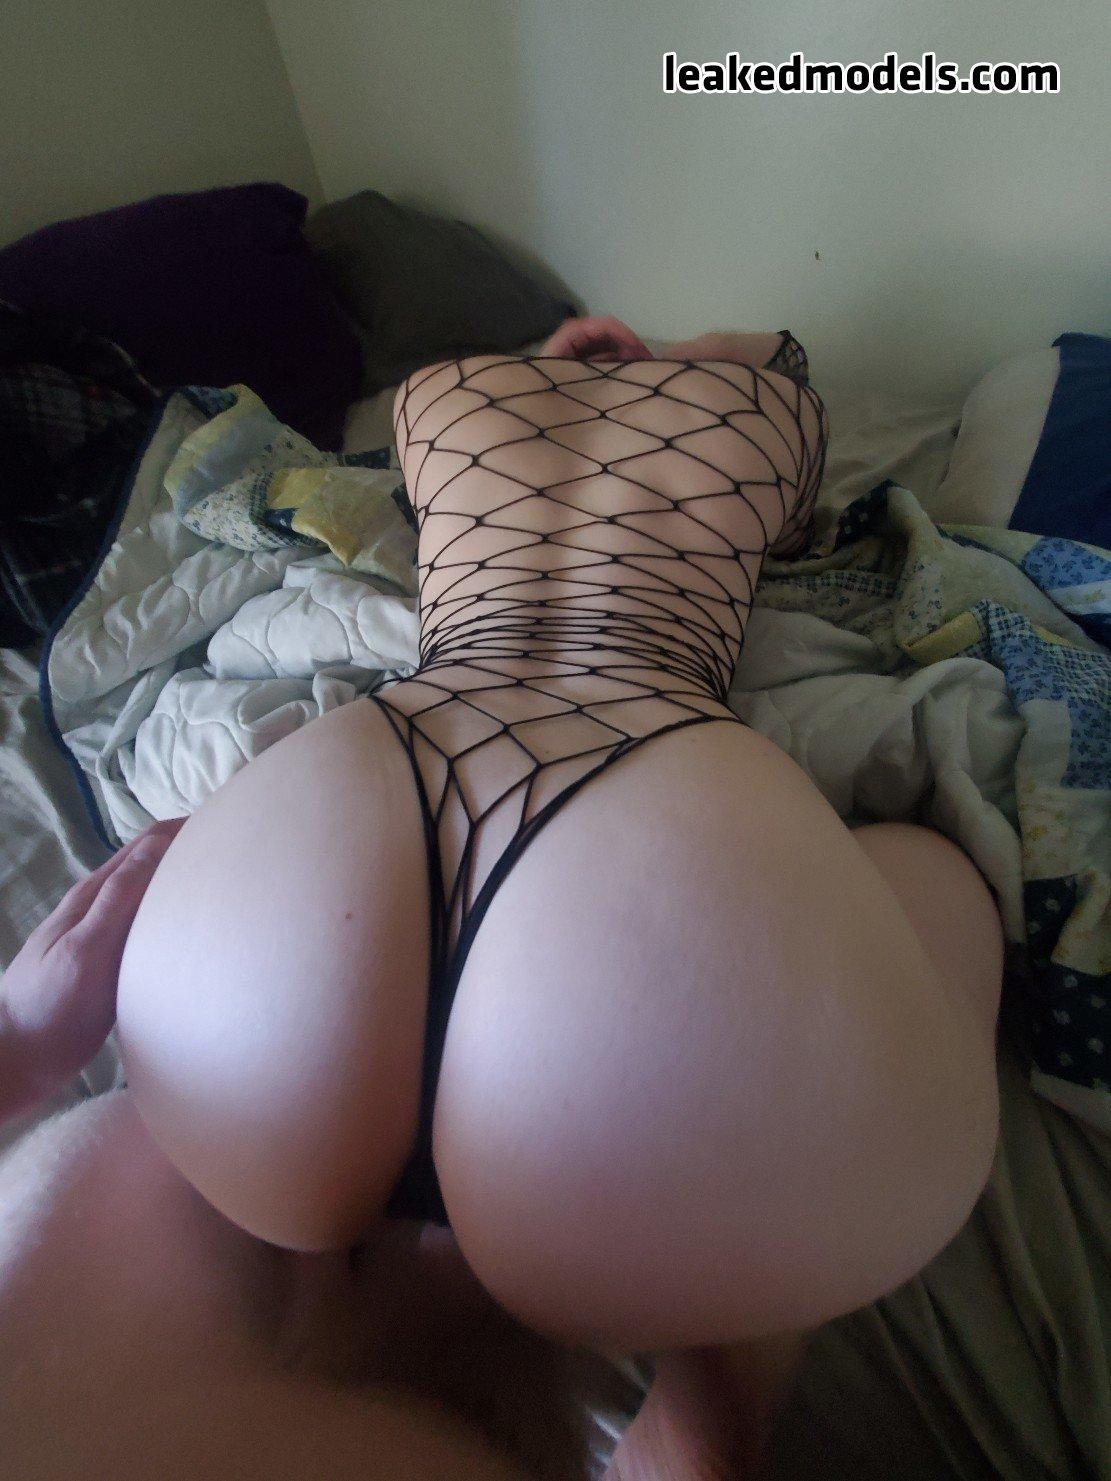 Stefffyxoxo OnlyFans Nude Leaks (41 Photos)